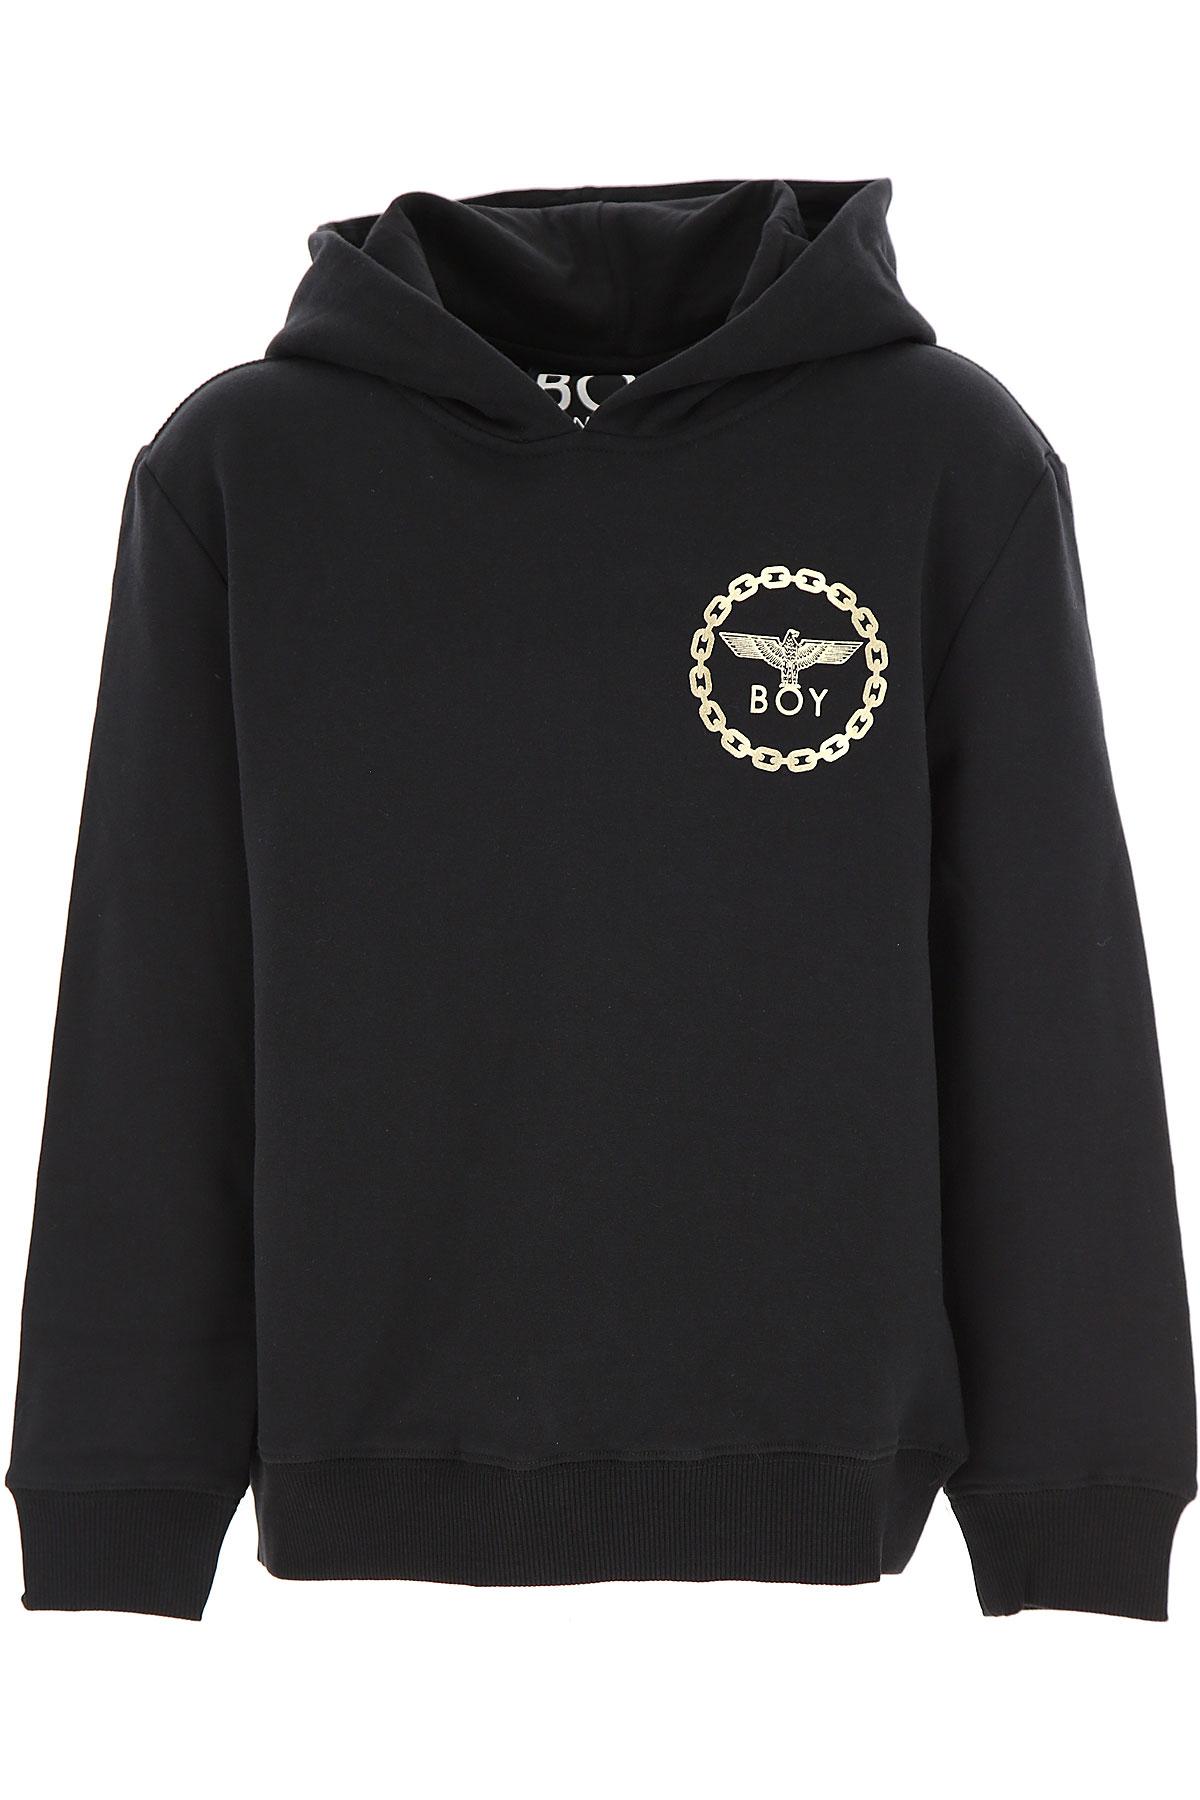 Boy London Kids Sweatshirts & Hoodies for Boys On Sale, Black, Cotton, 2019, 10Y 14Y